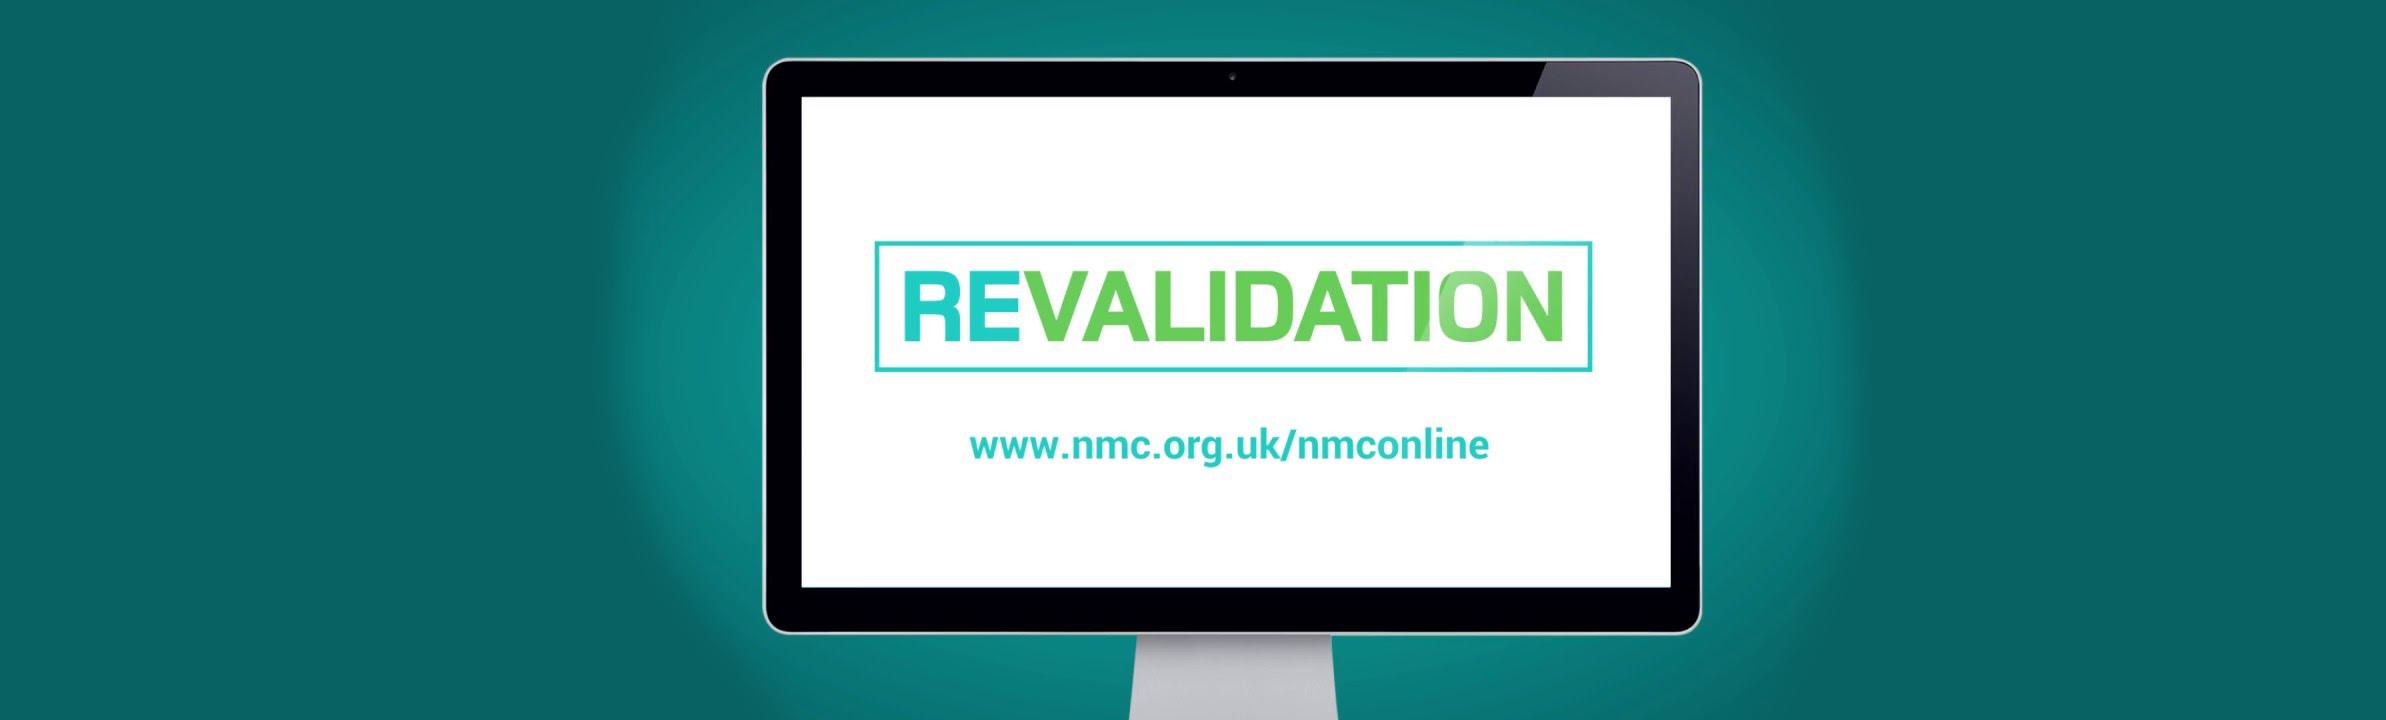 NMC Revalidation